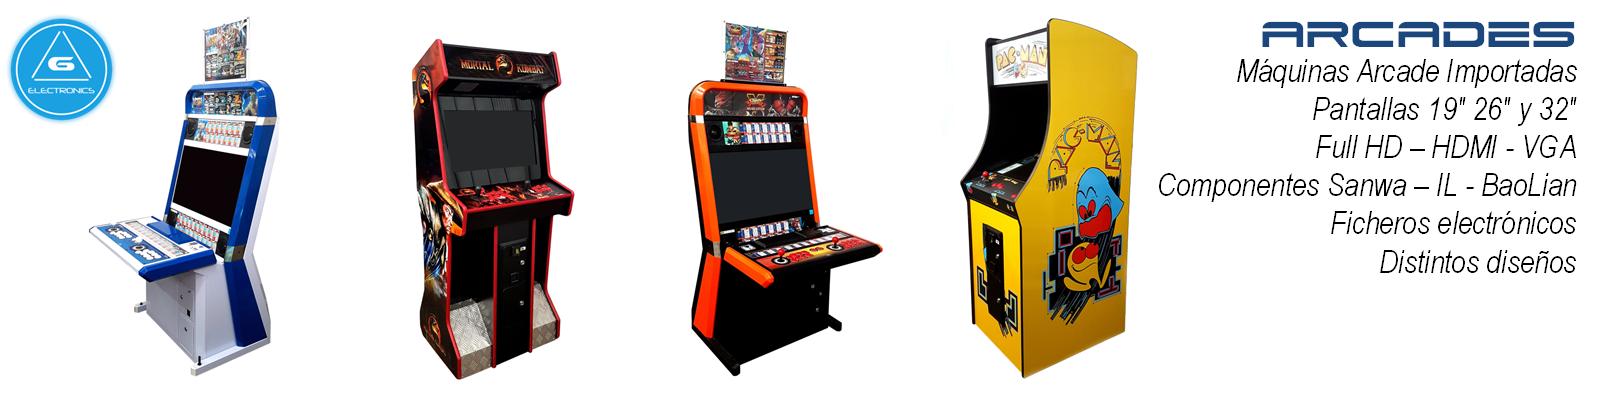 Destacados Arcades